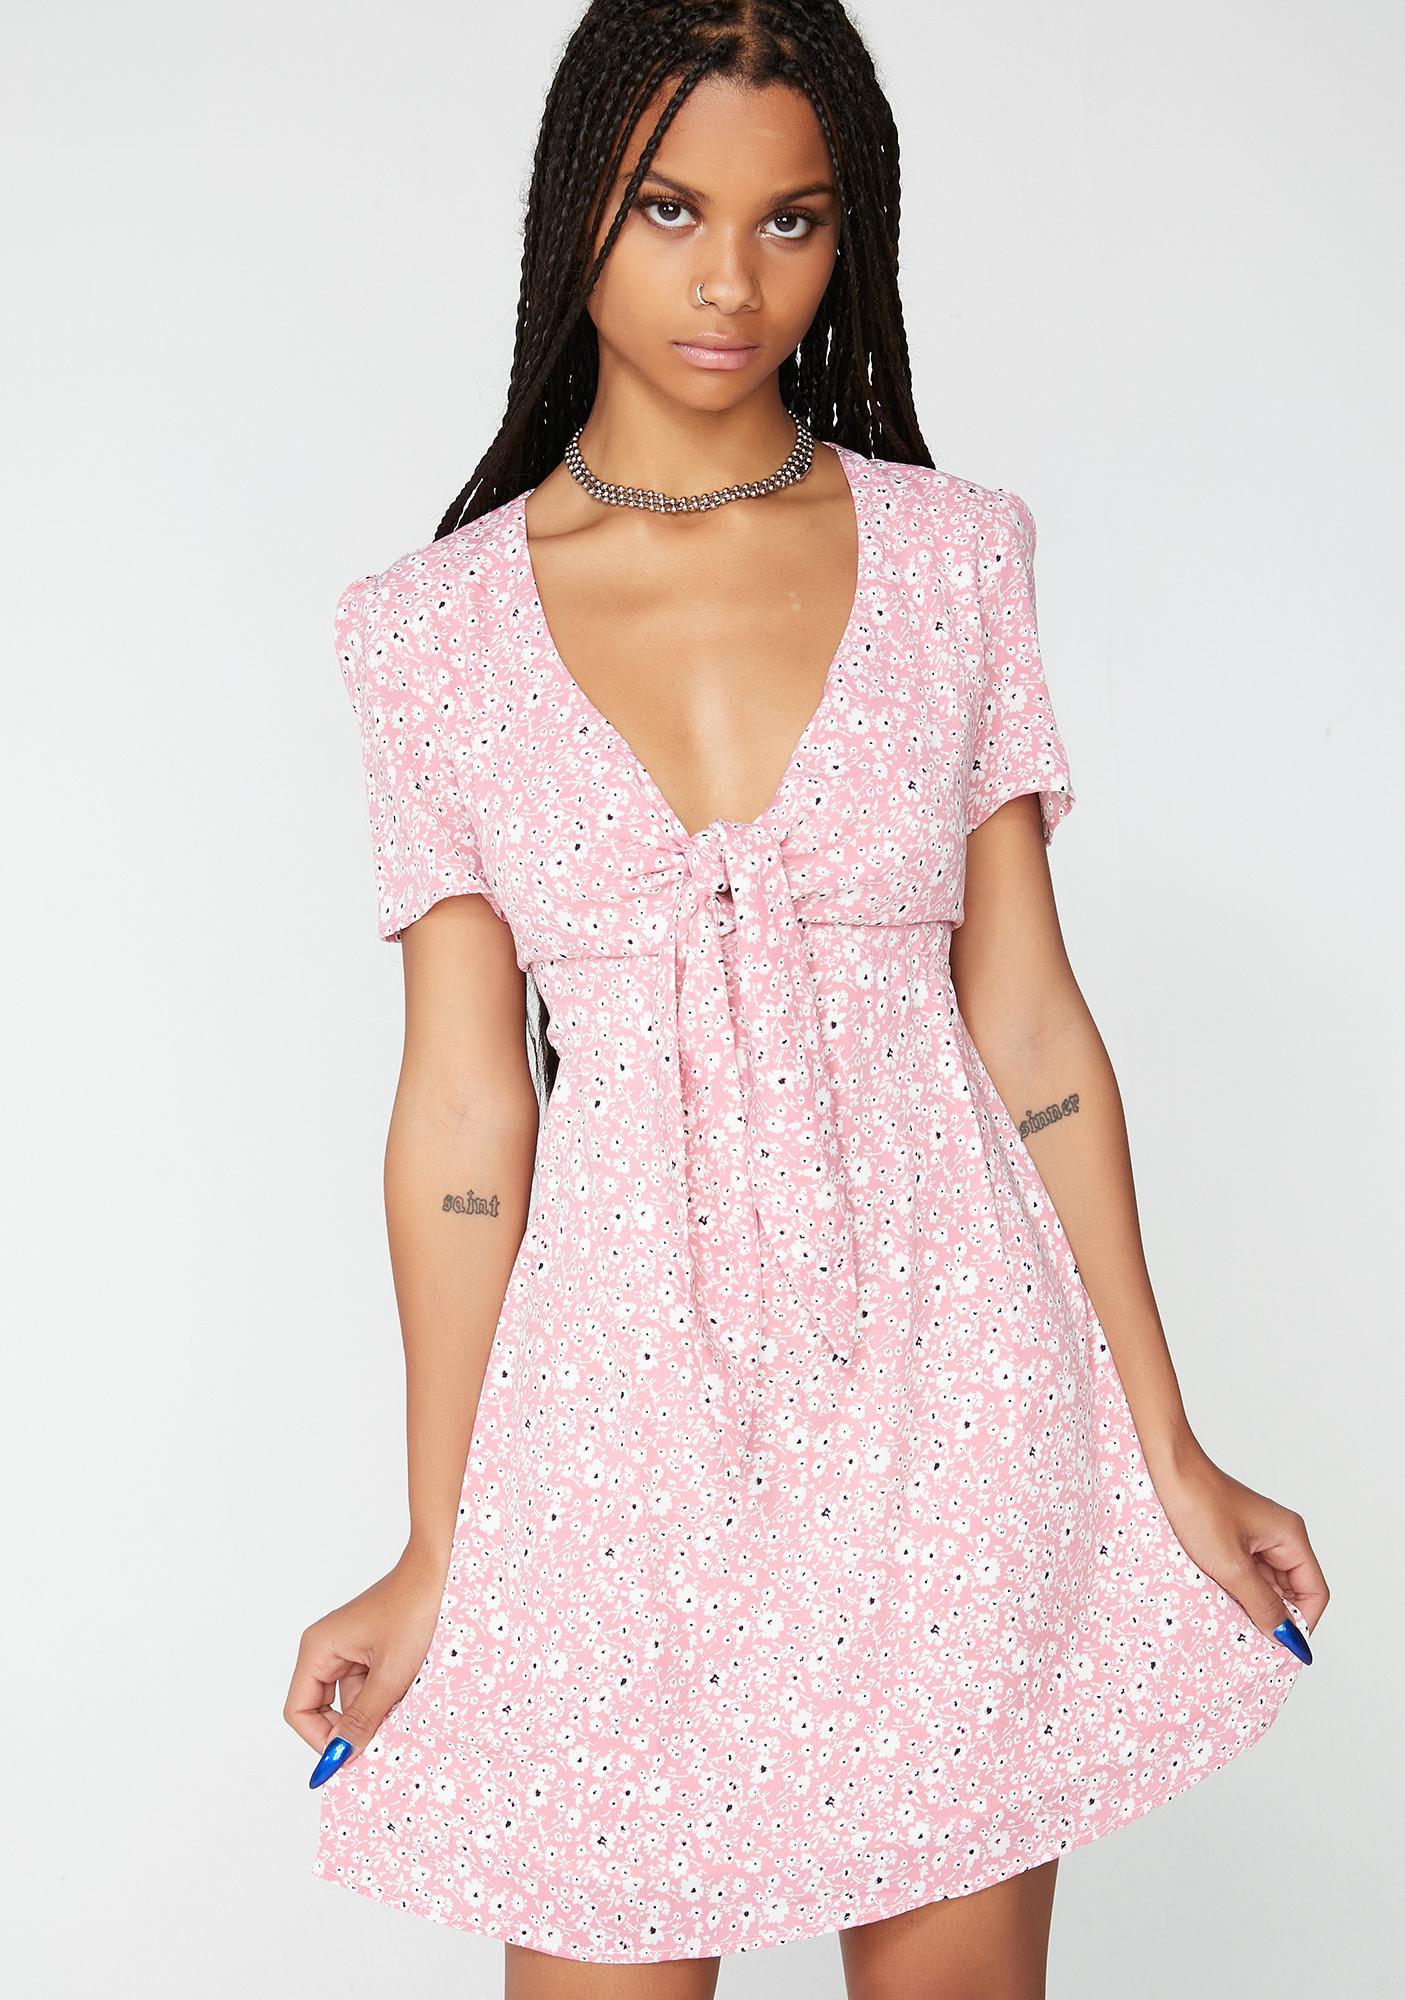 Glamorous Delilah Daisy Floral Dress